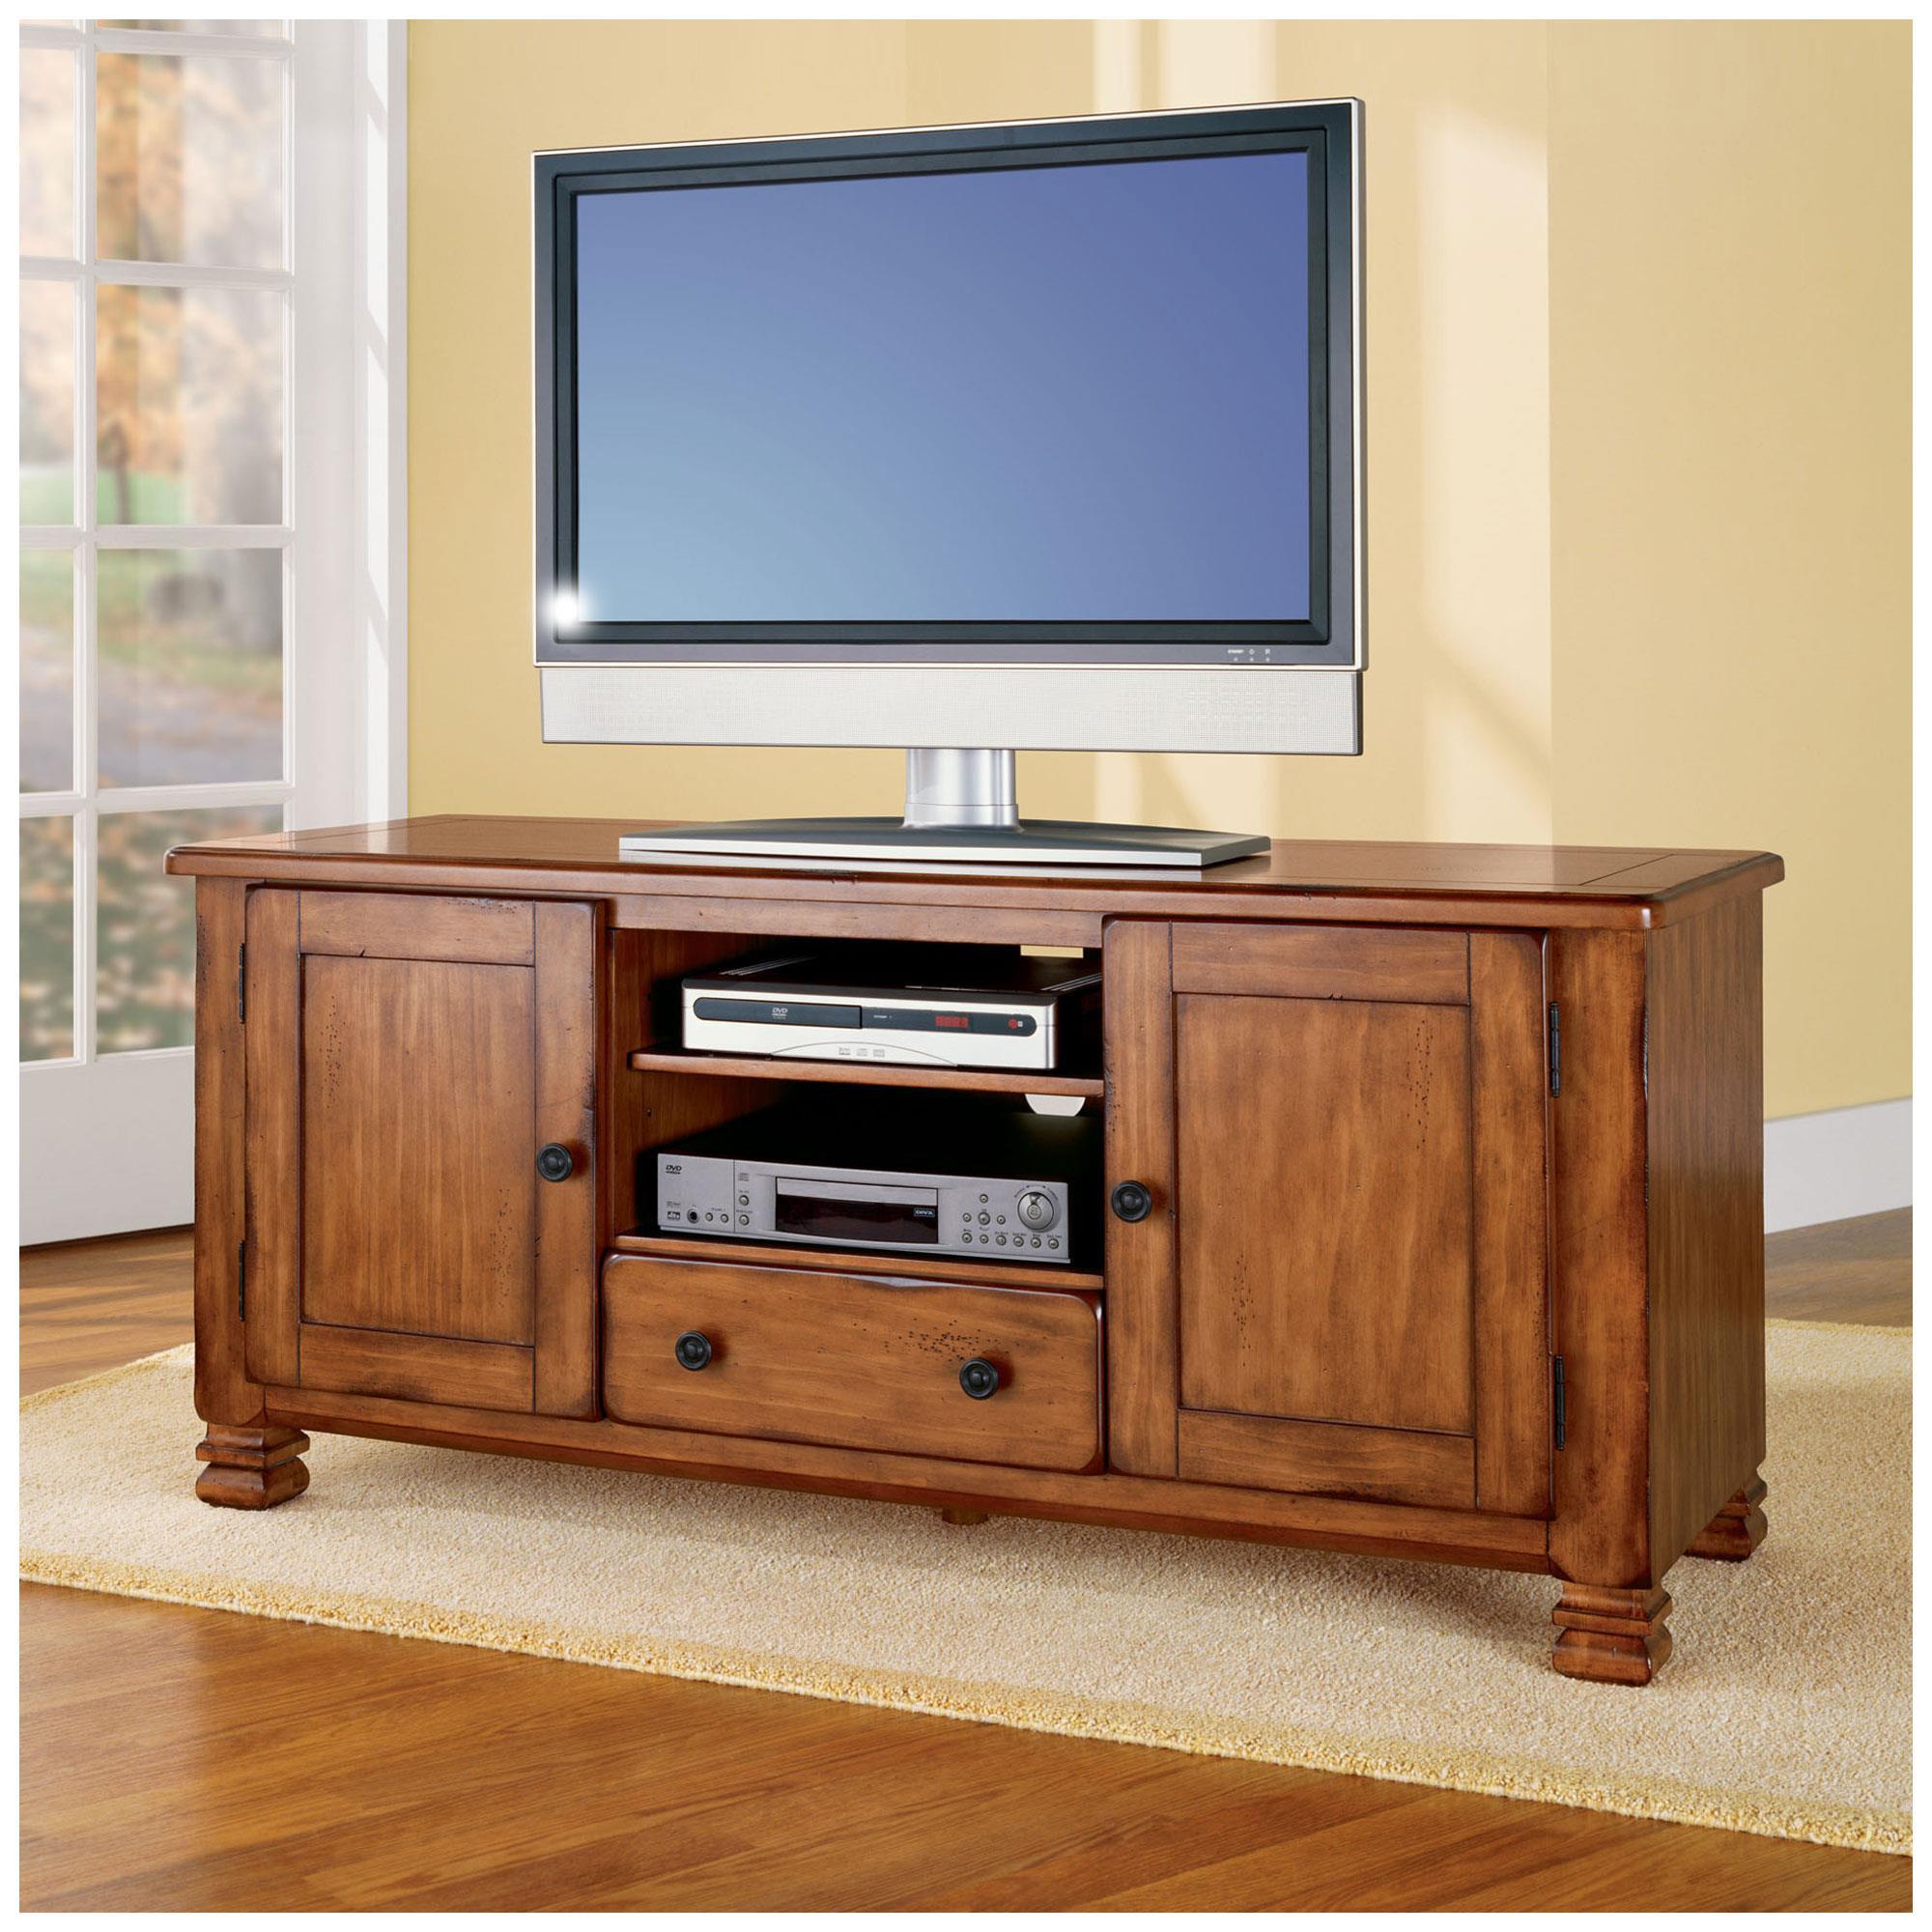 Dorel home furnishings summit mountain tuscany oak tv stand